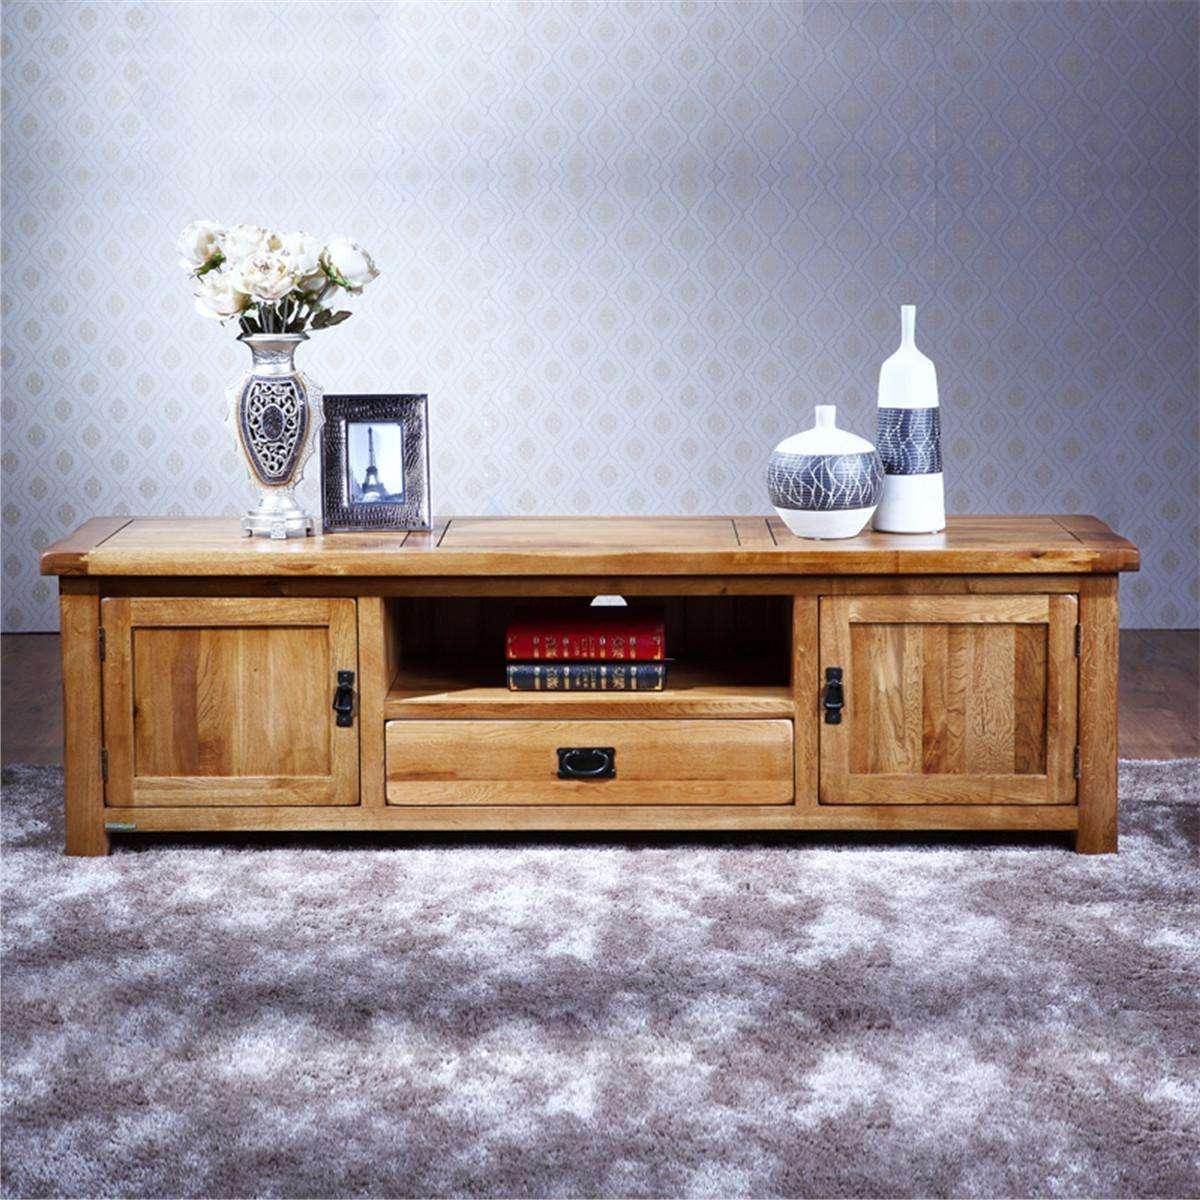 Honey Oak Tv Stand : Innovative Designs Oak Tv Console – Marku Pertaining To Tv Stands In Oak (View 12 of 15)